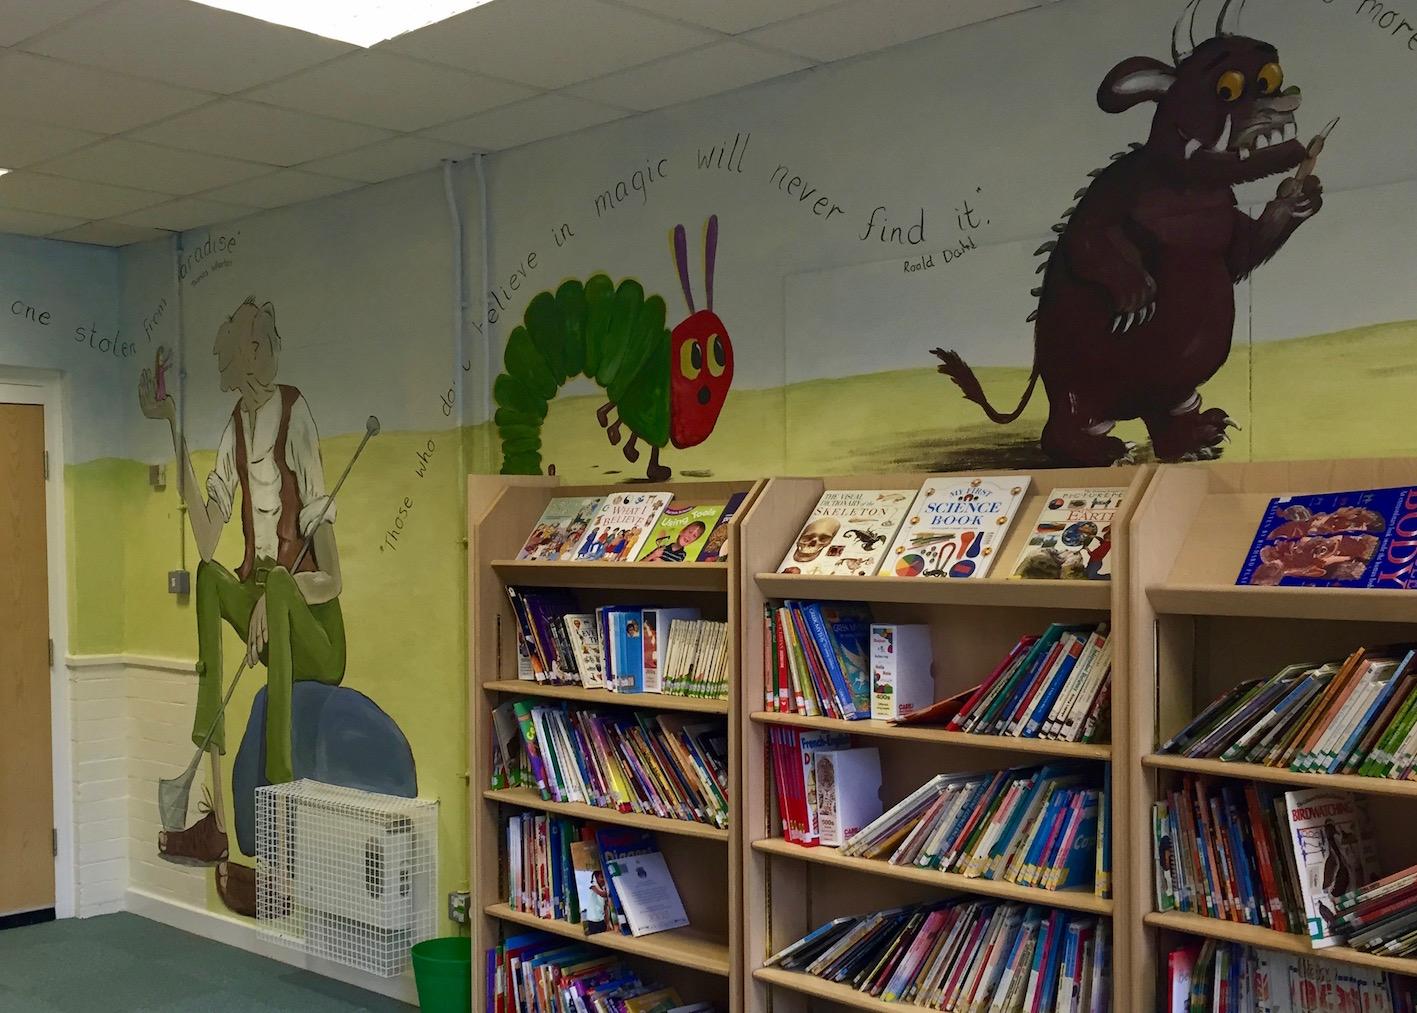 Library Mural Ursula Hurst